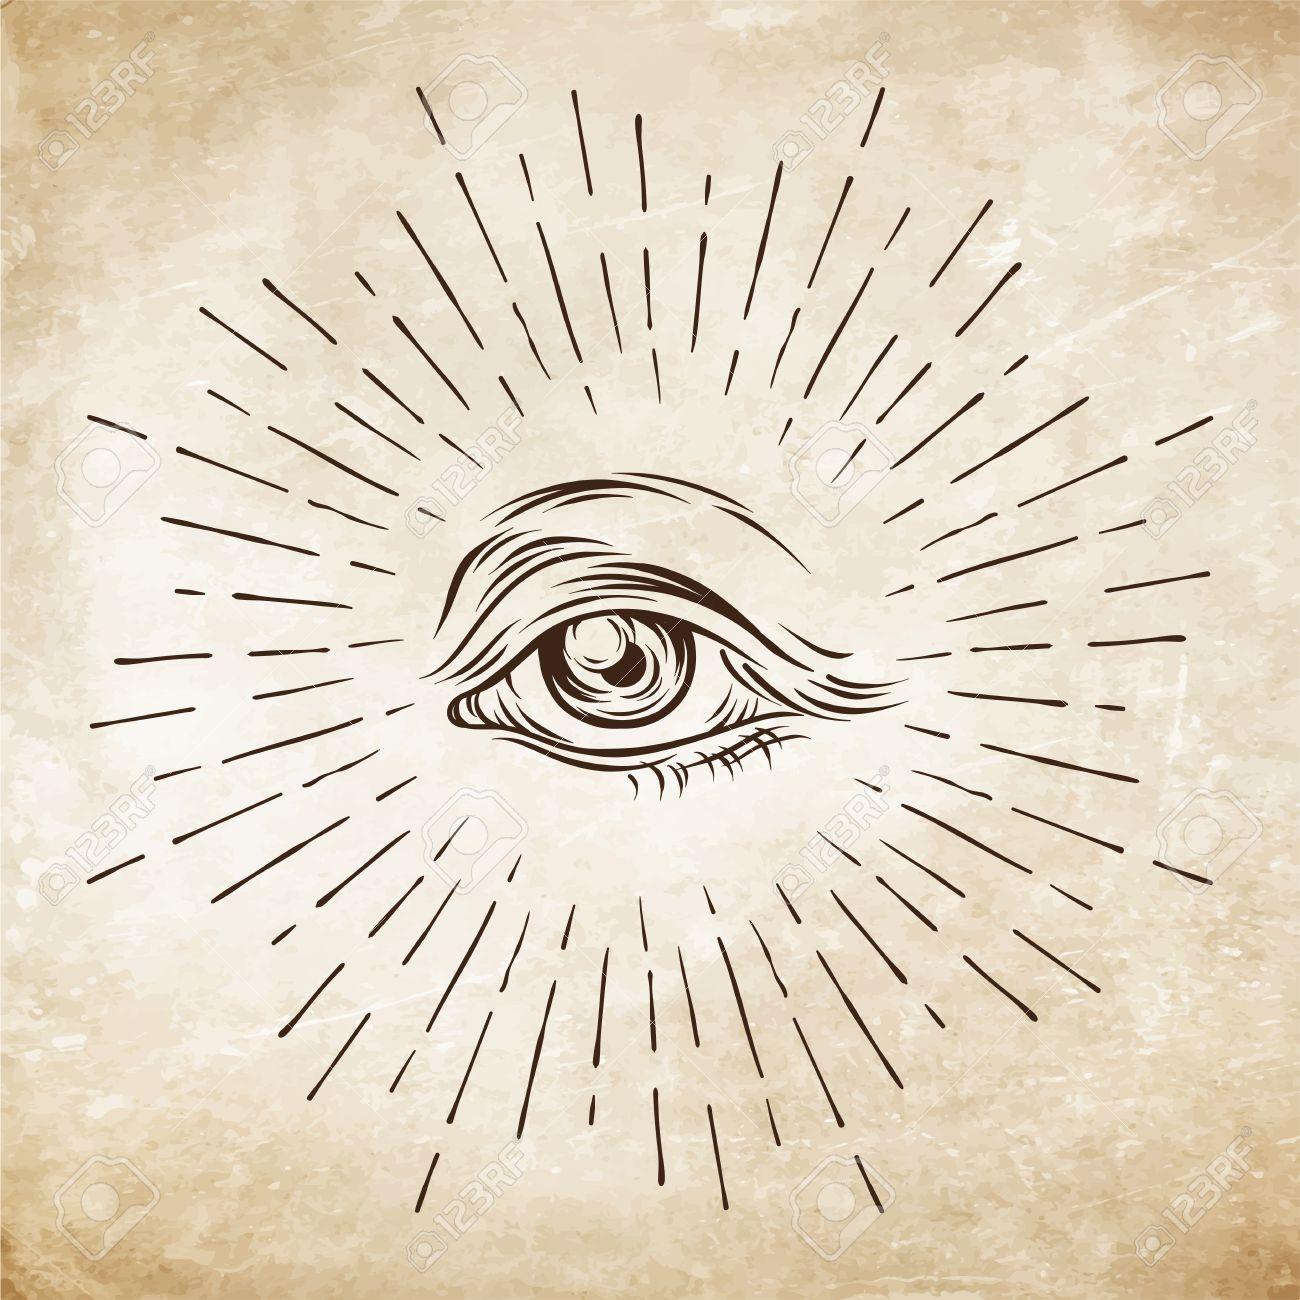 1300x1300 Hand Drawn Grunge Sketch Eye Of Providence. Masonic Symbol. All